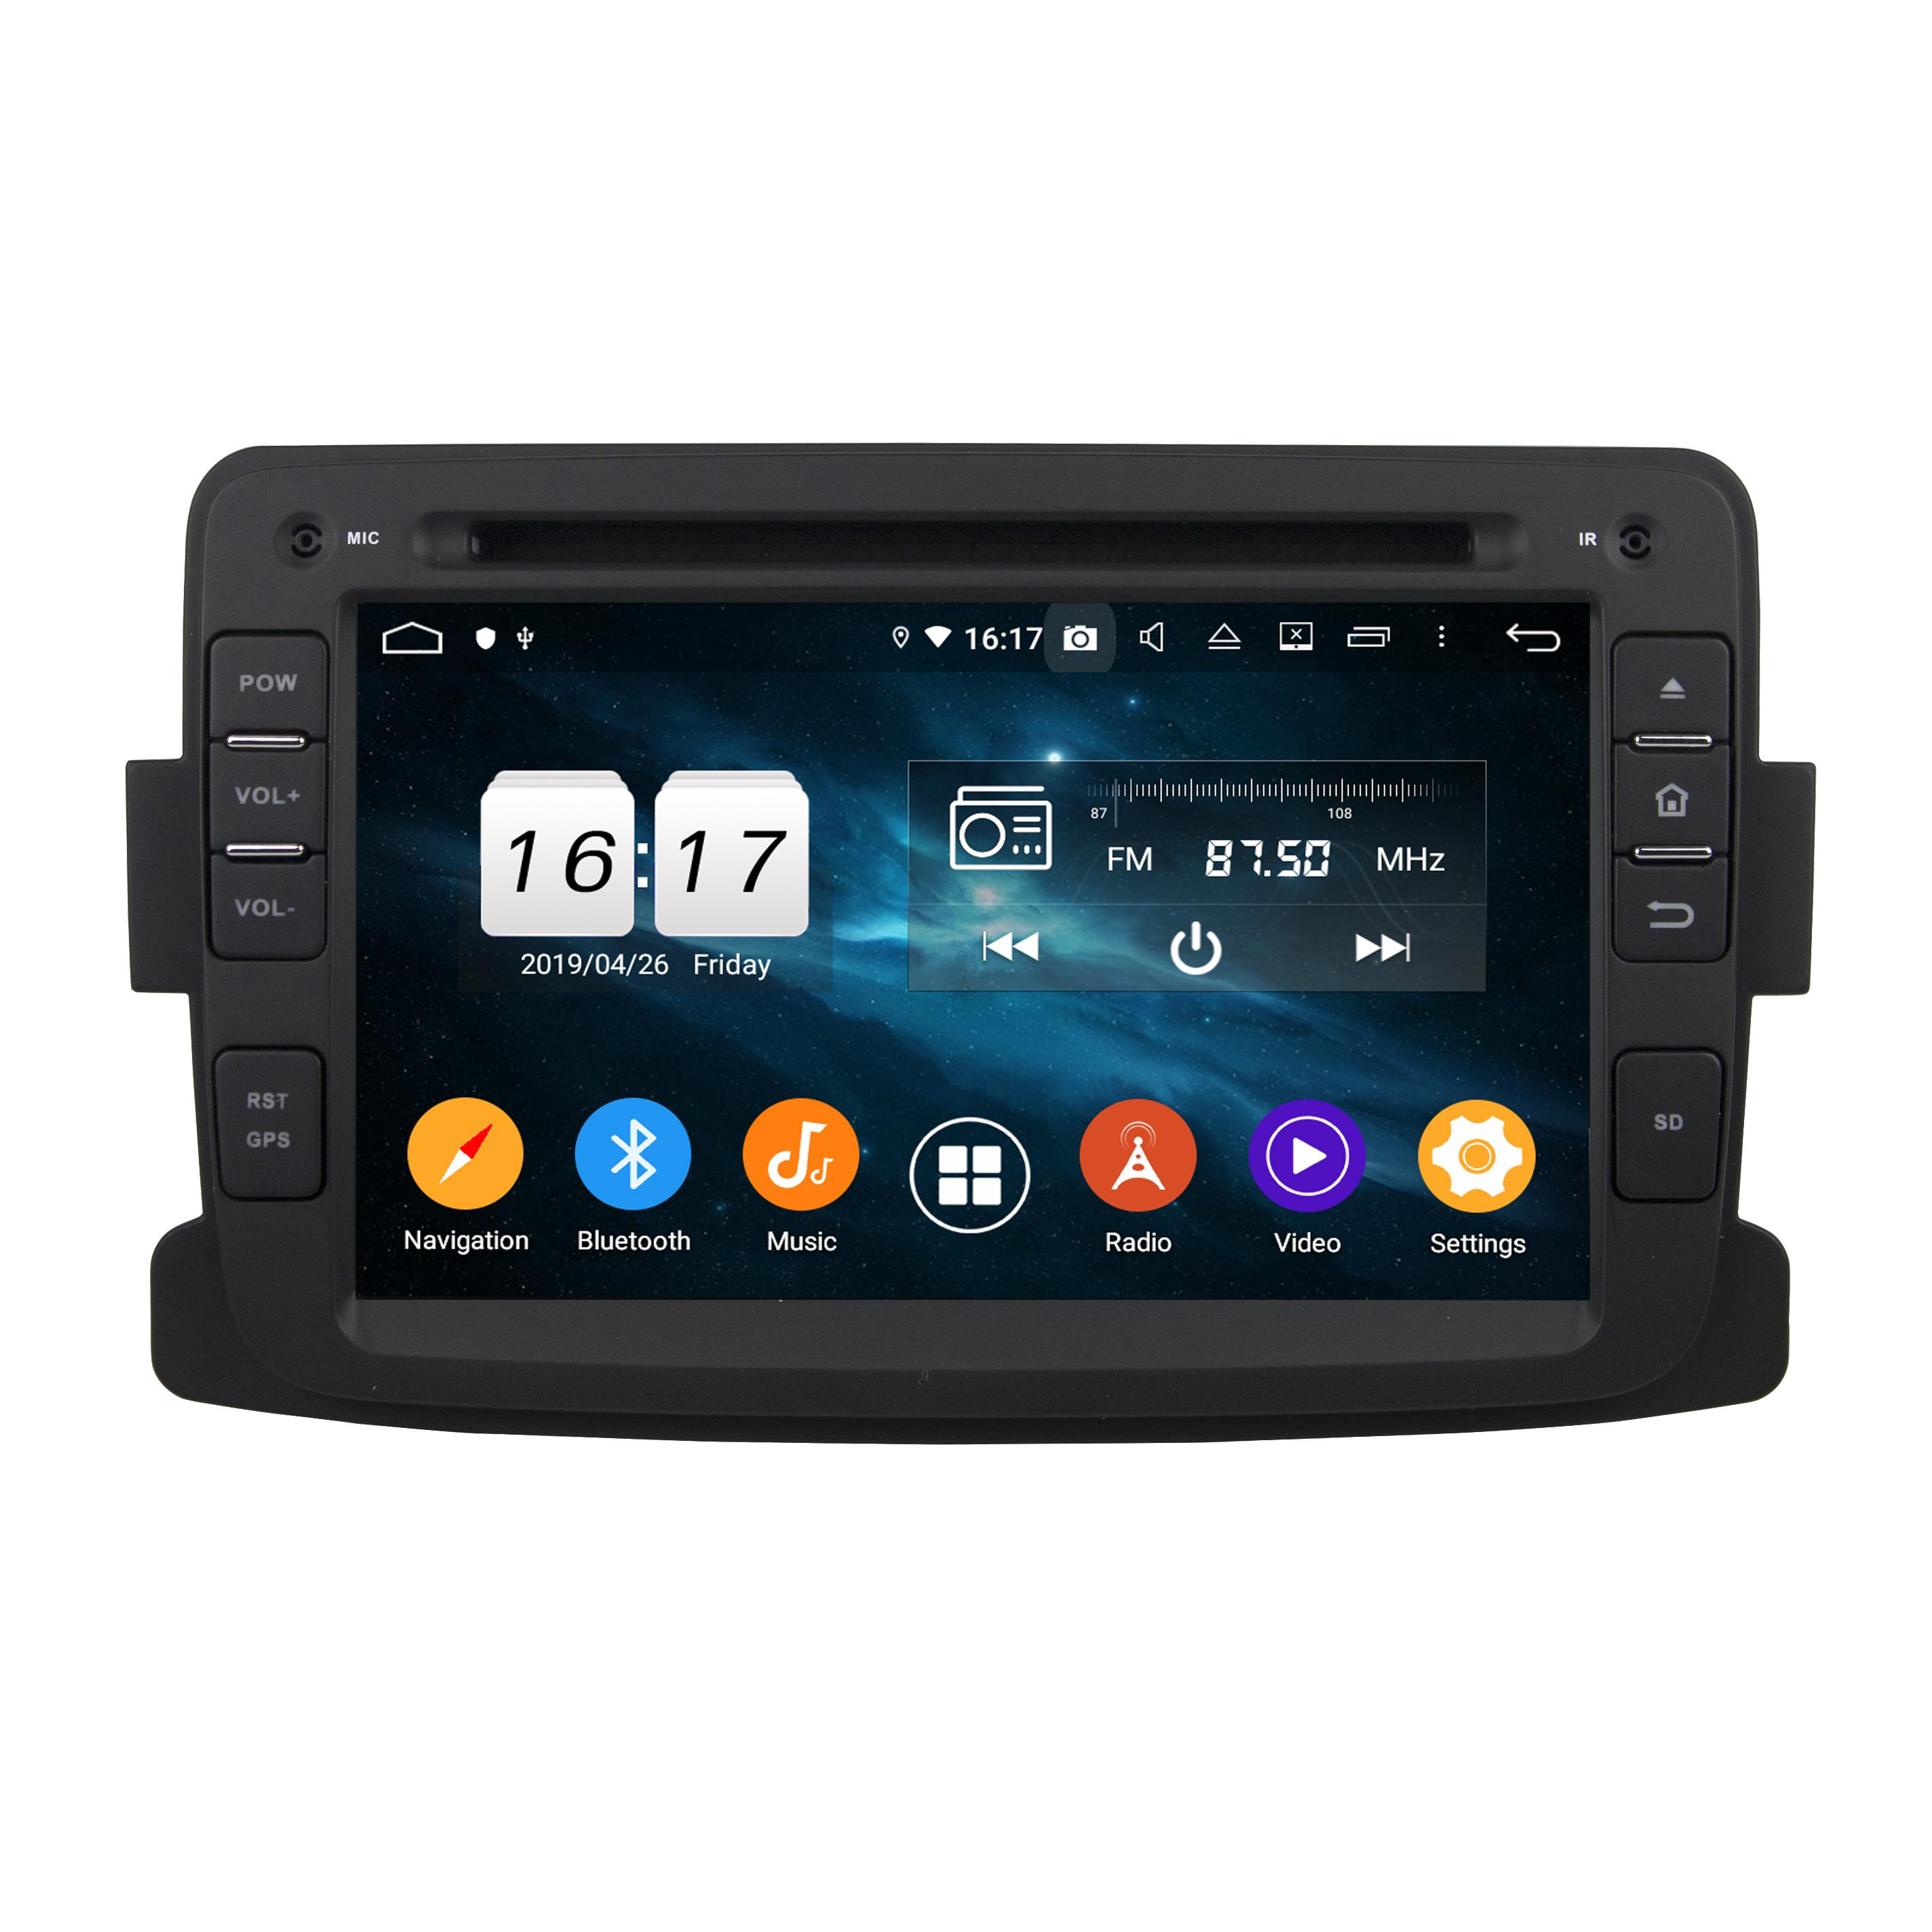 PX5 8 Ядро Android 9.0 4G 32G 1 DIN Автомобильный DVD GPS стерео для Renault Duster 2014-2016